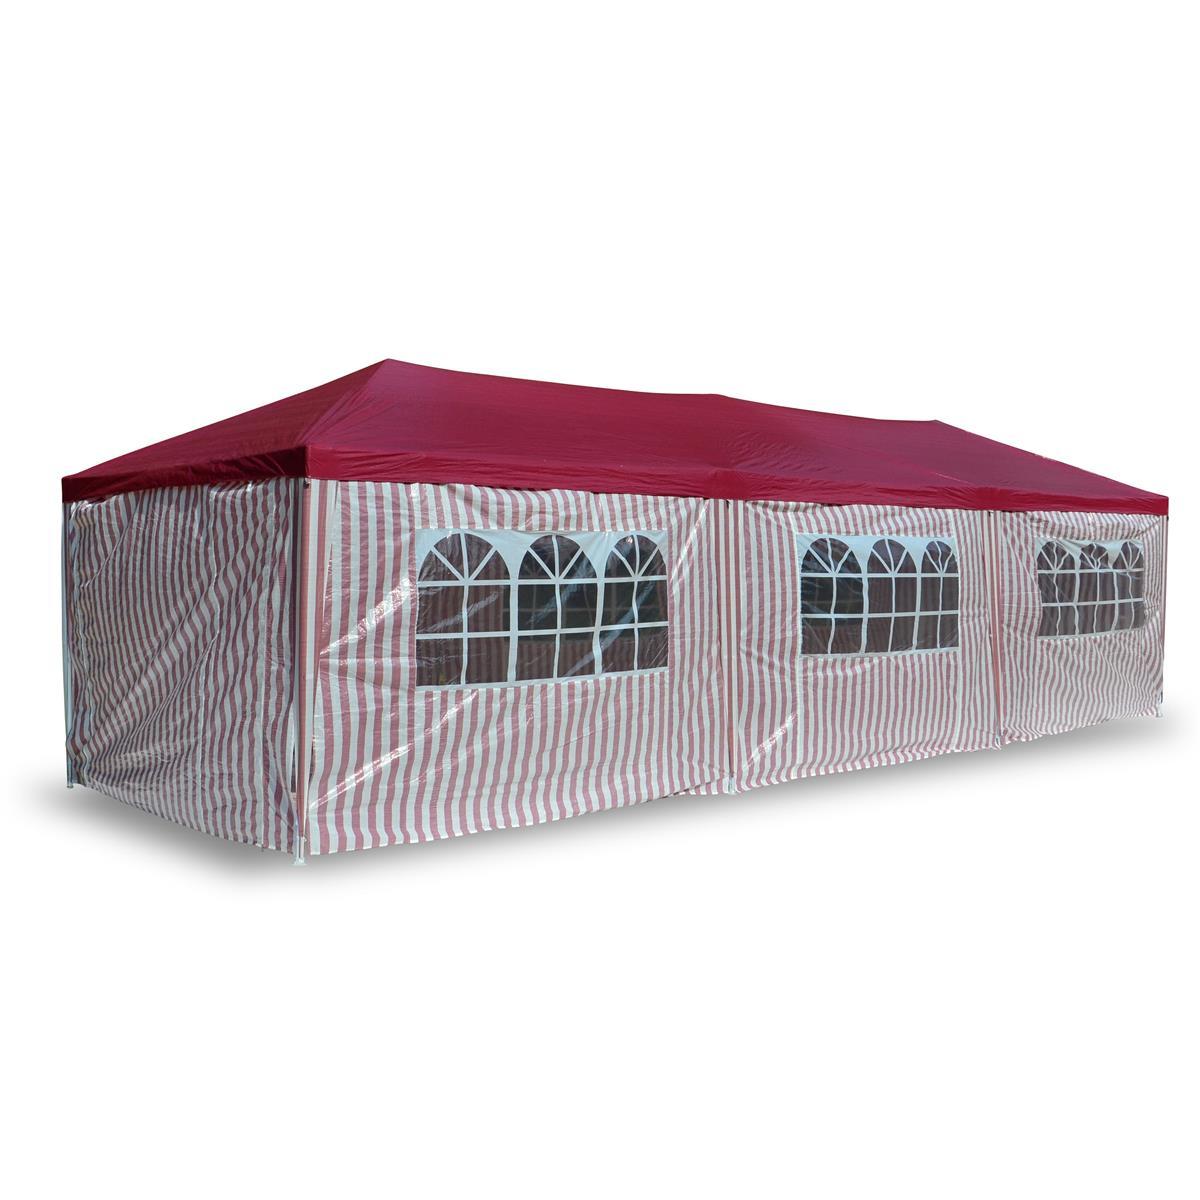 Pavillon Partyzelt Raucherzelt rot weiß 3x9m PE Gartenzelt Festzelt  Marktzelt